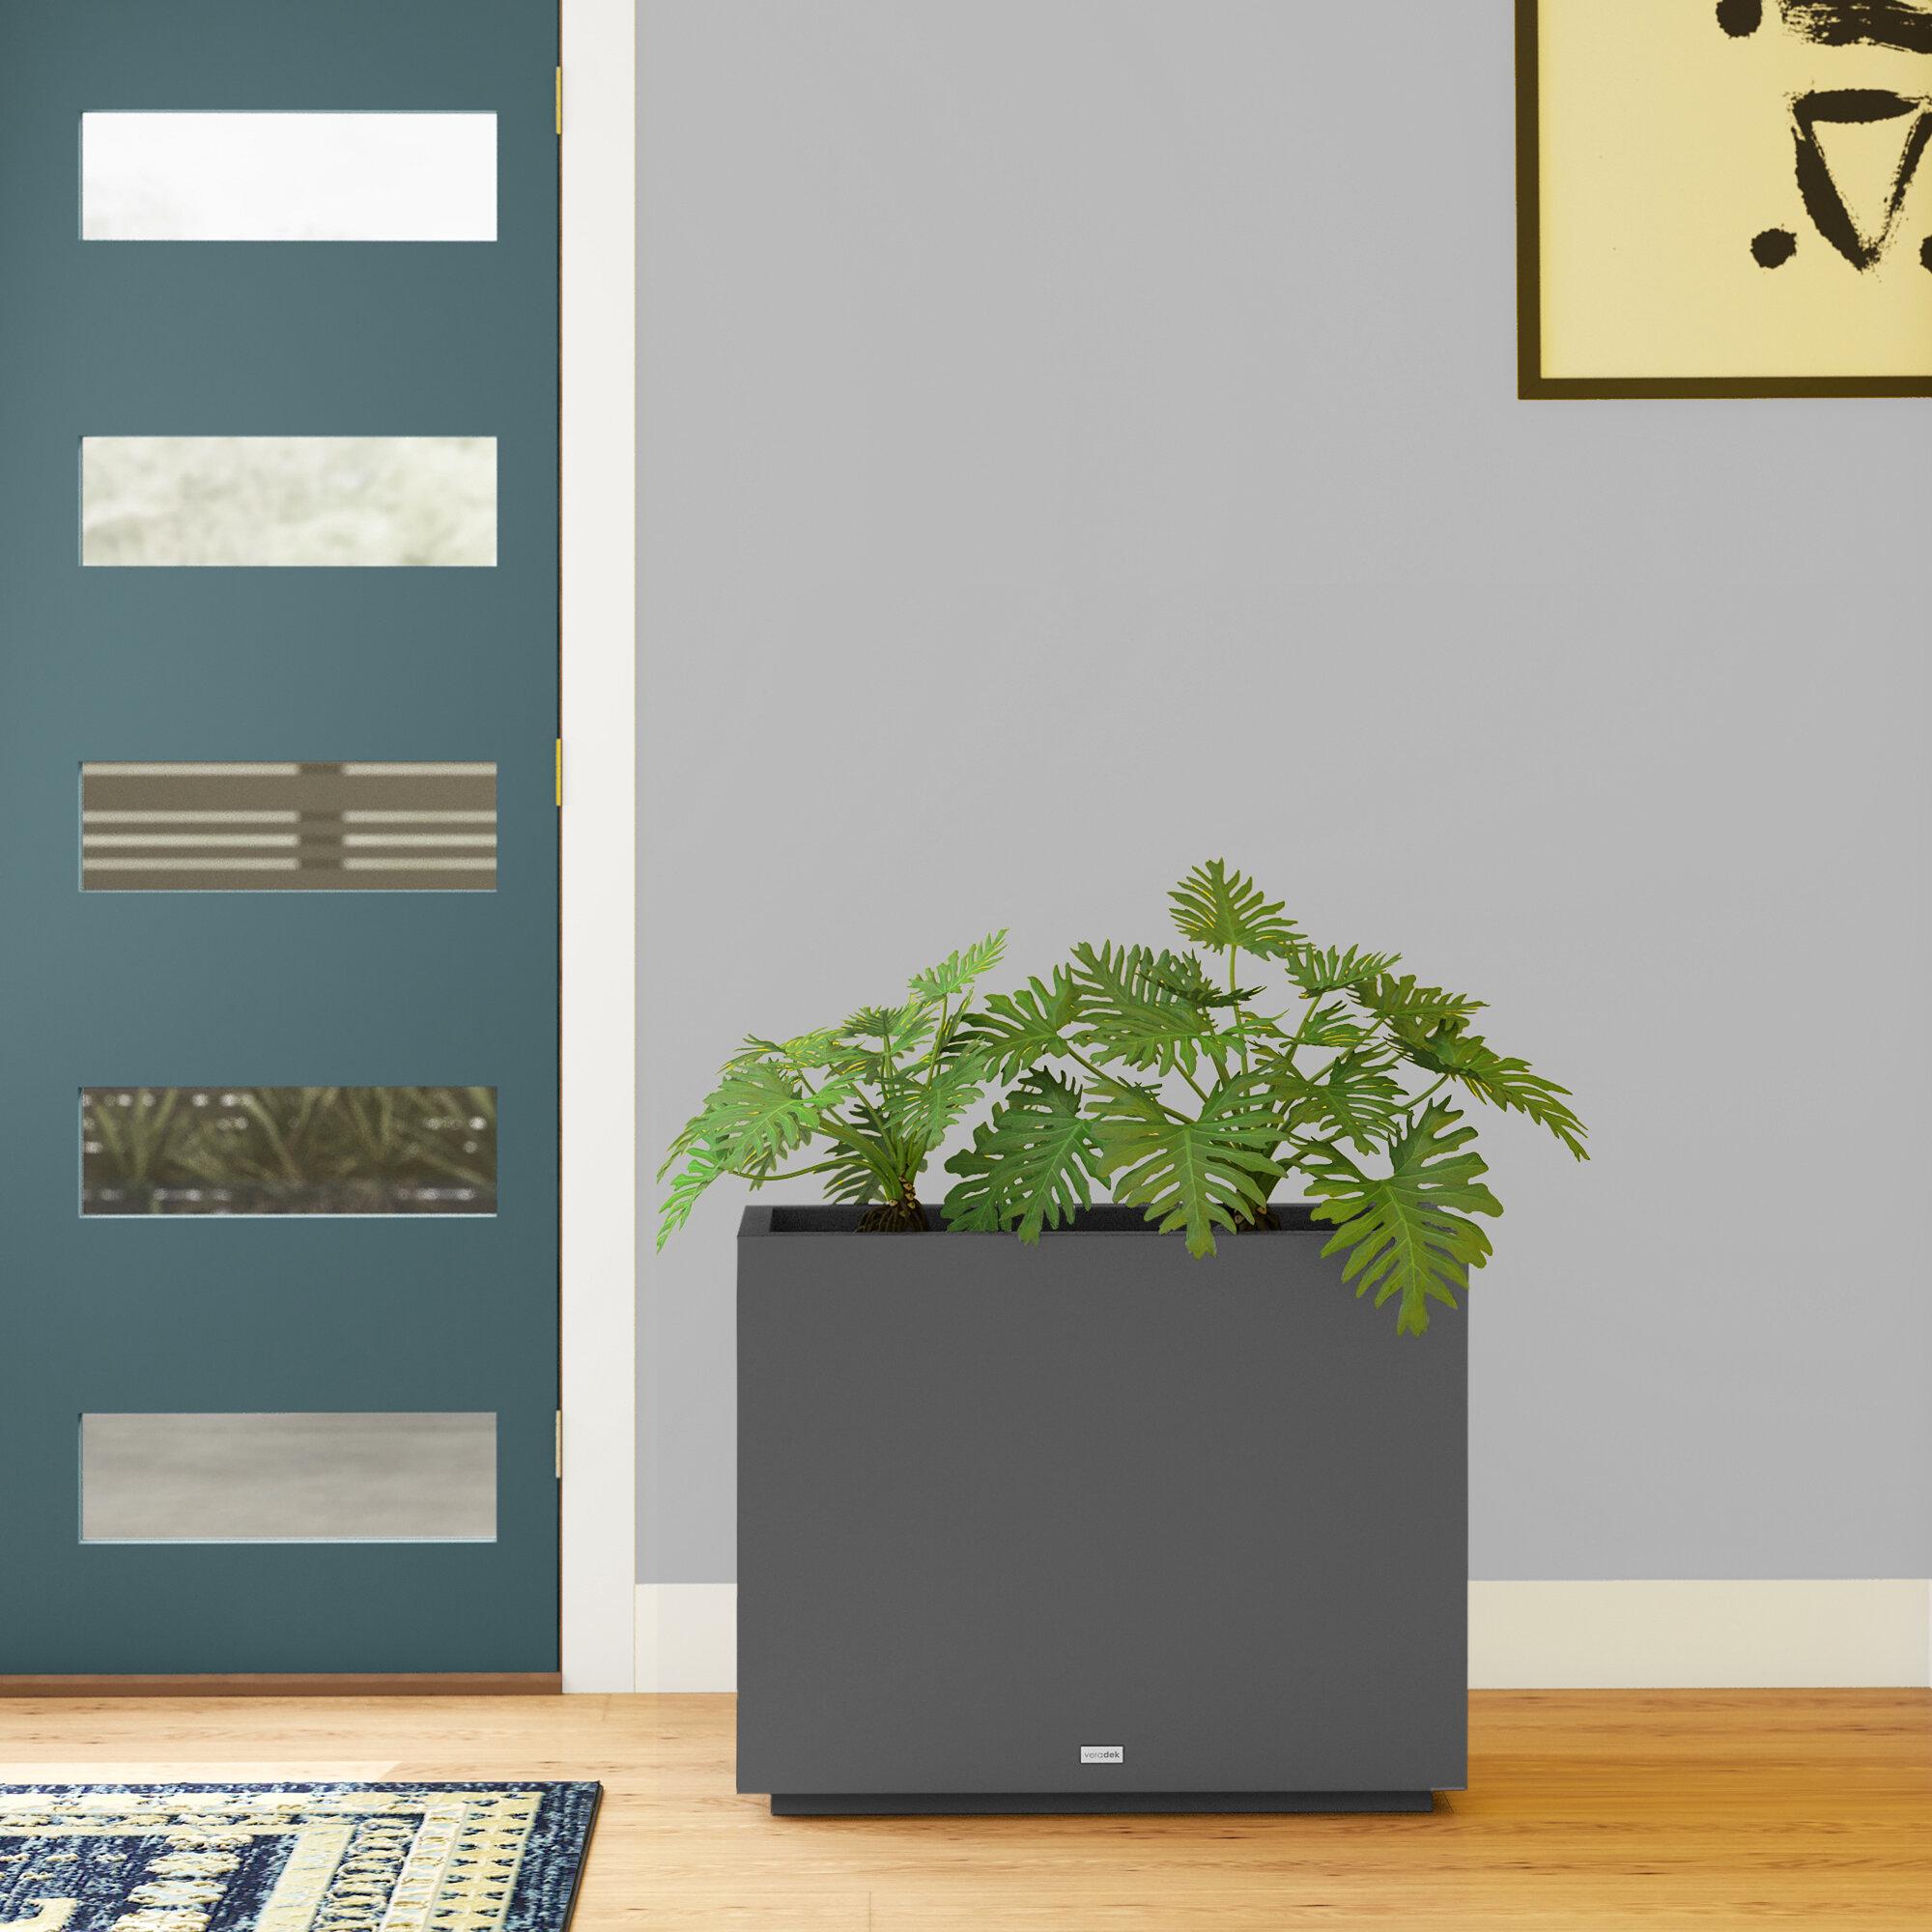 Metallic Series Galvanized Powder Coated Steel Planter Box Reviews Allmodern